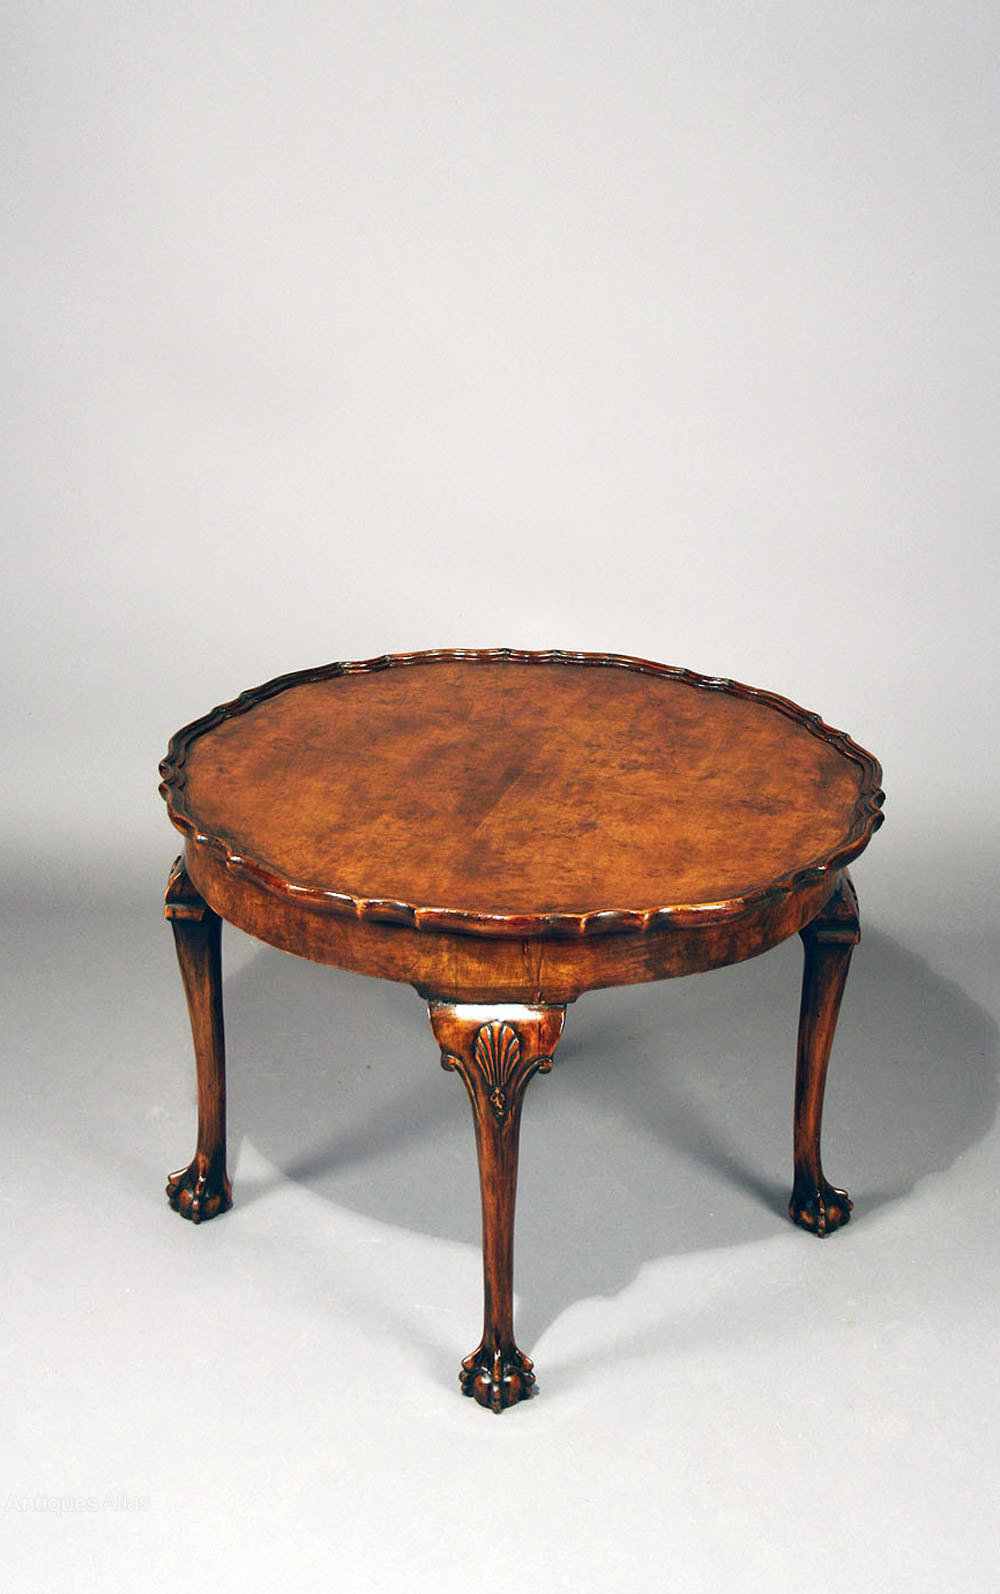 Antique Walnut Pie Crust Edge Coffee Table Antique Coffee Tables ...